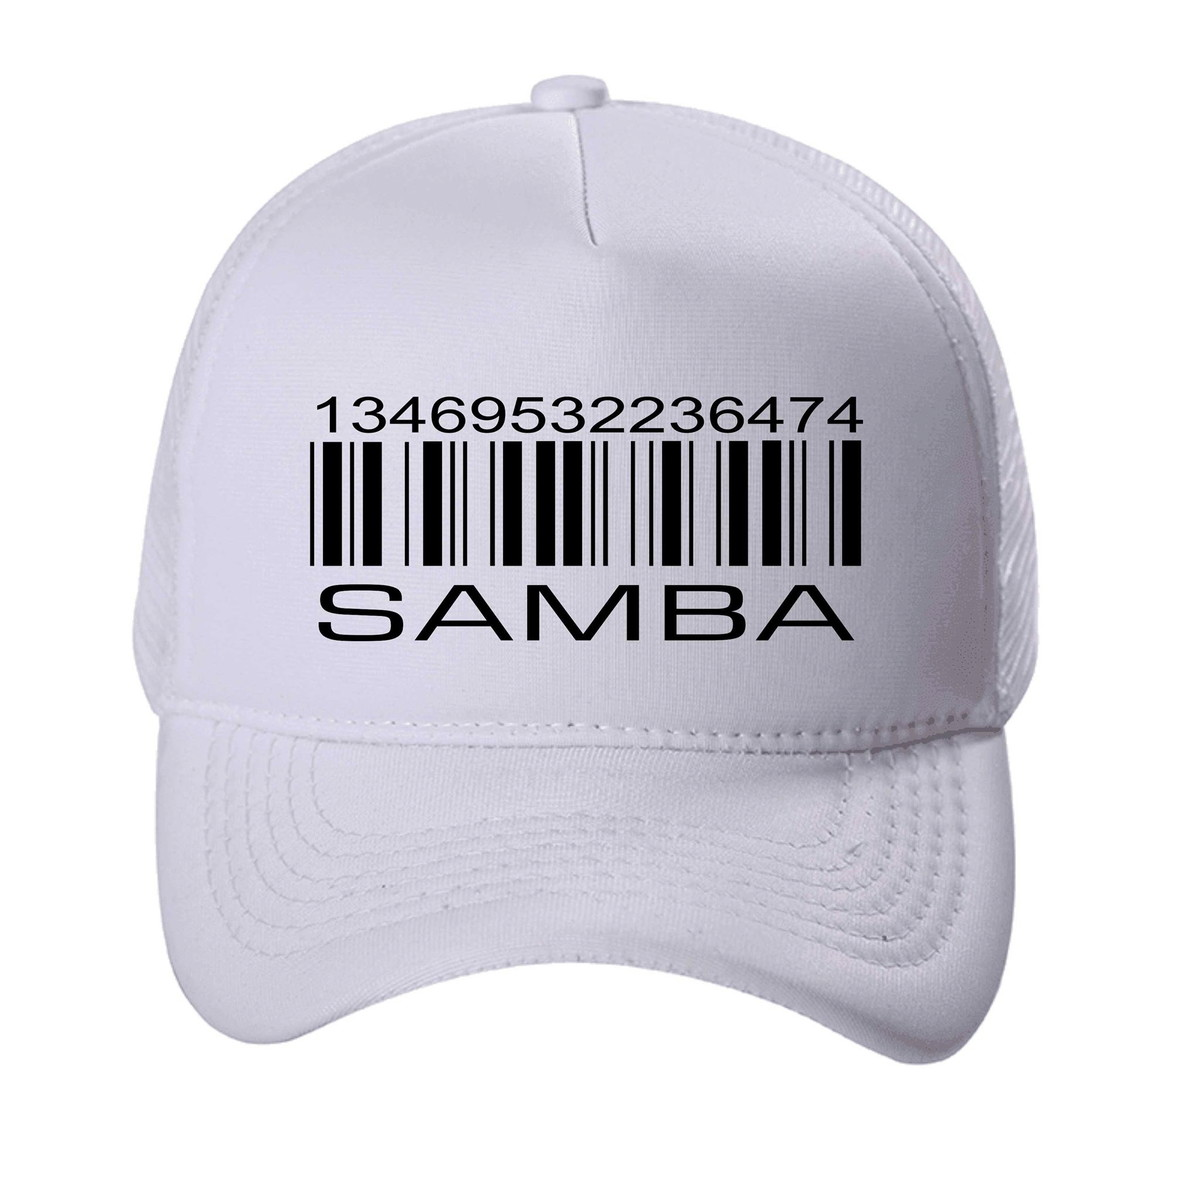 8d9cab0e60 Boné Trucker Aba Curva Código de Samba + Brinde no Elo7 | Blackchic ...